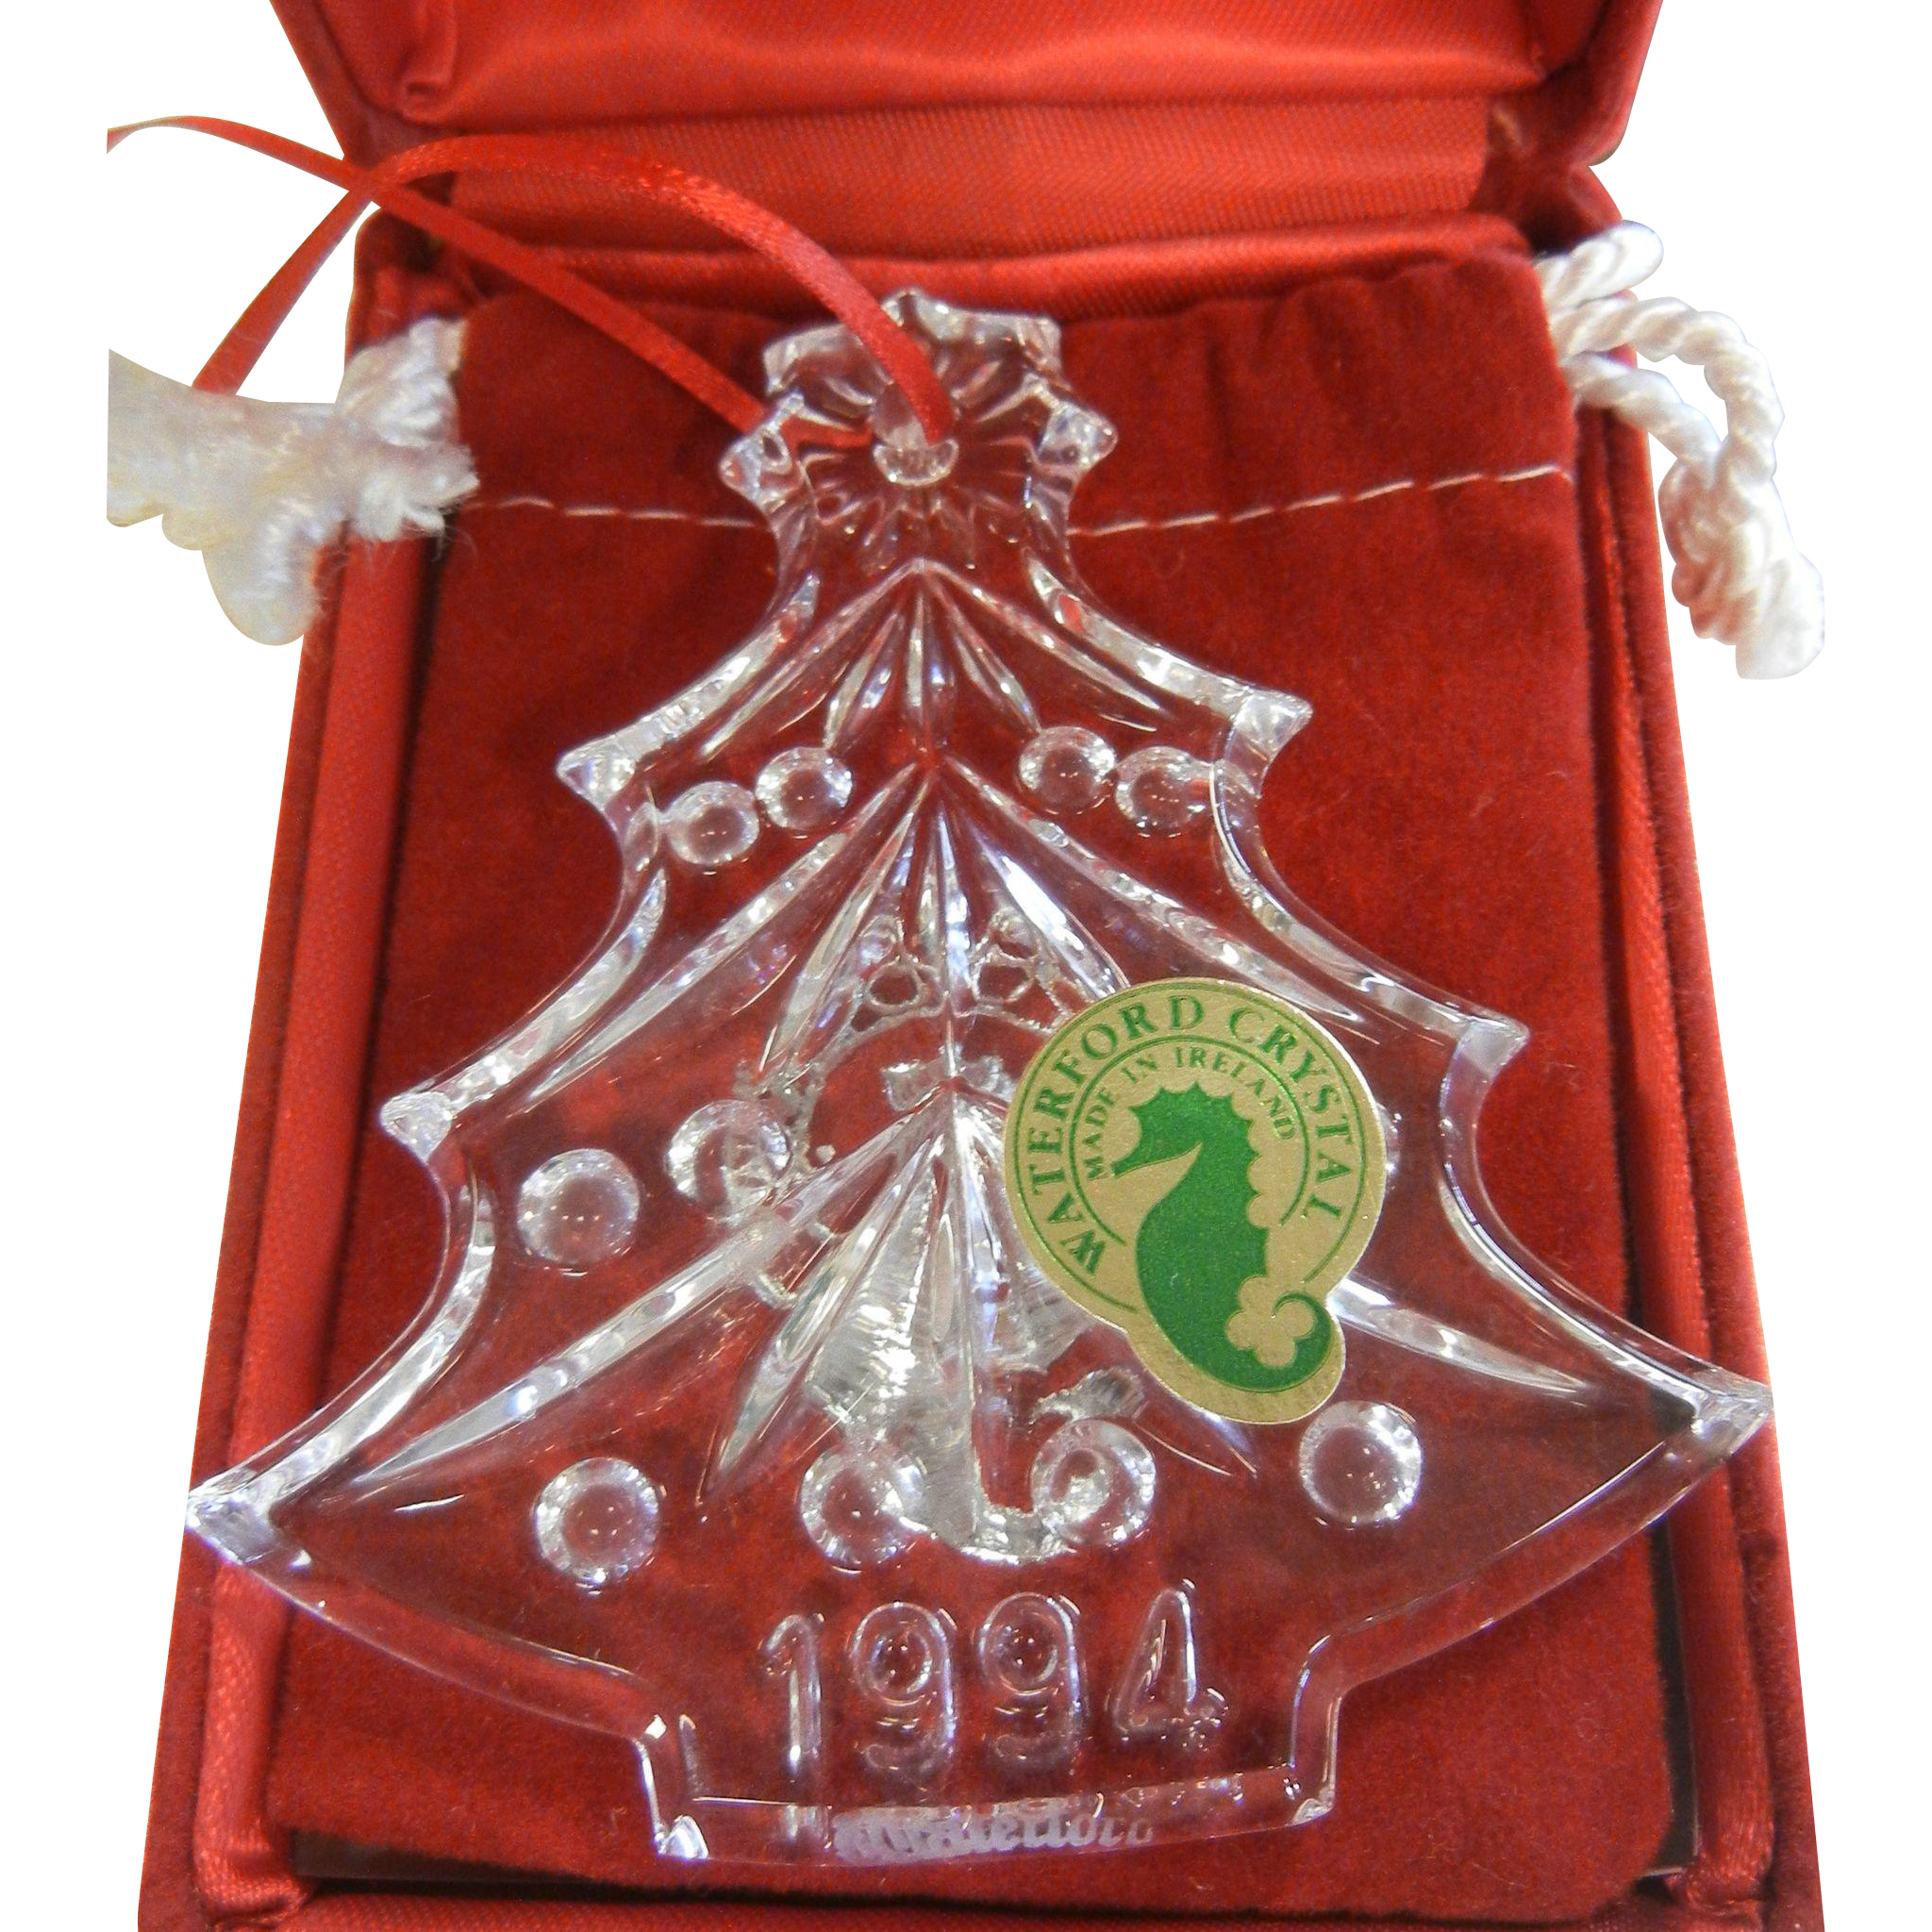 Vintage Waterford Crystal Christmas Tree Ornament 1994